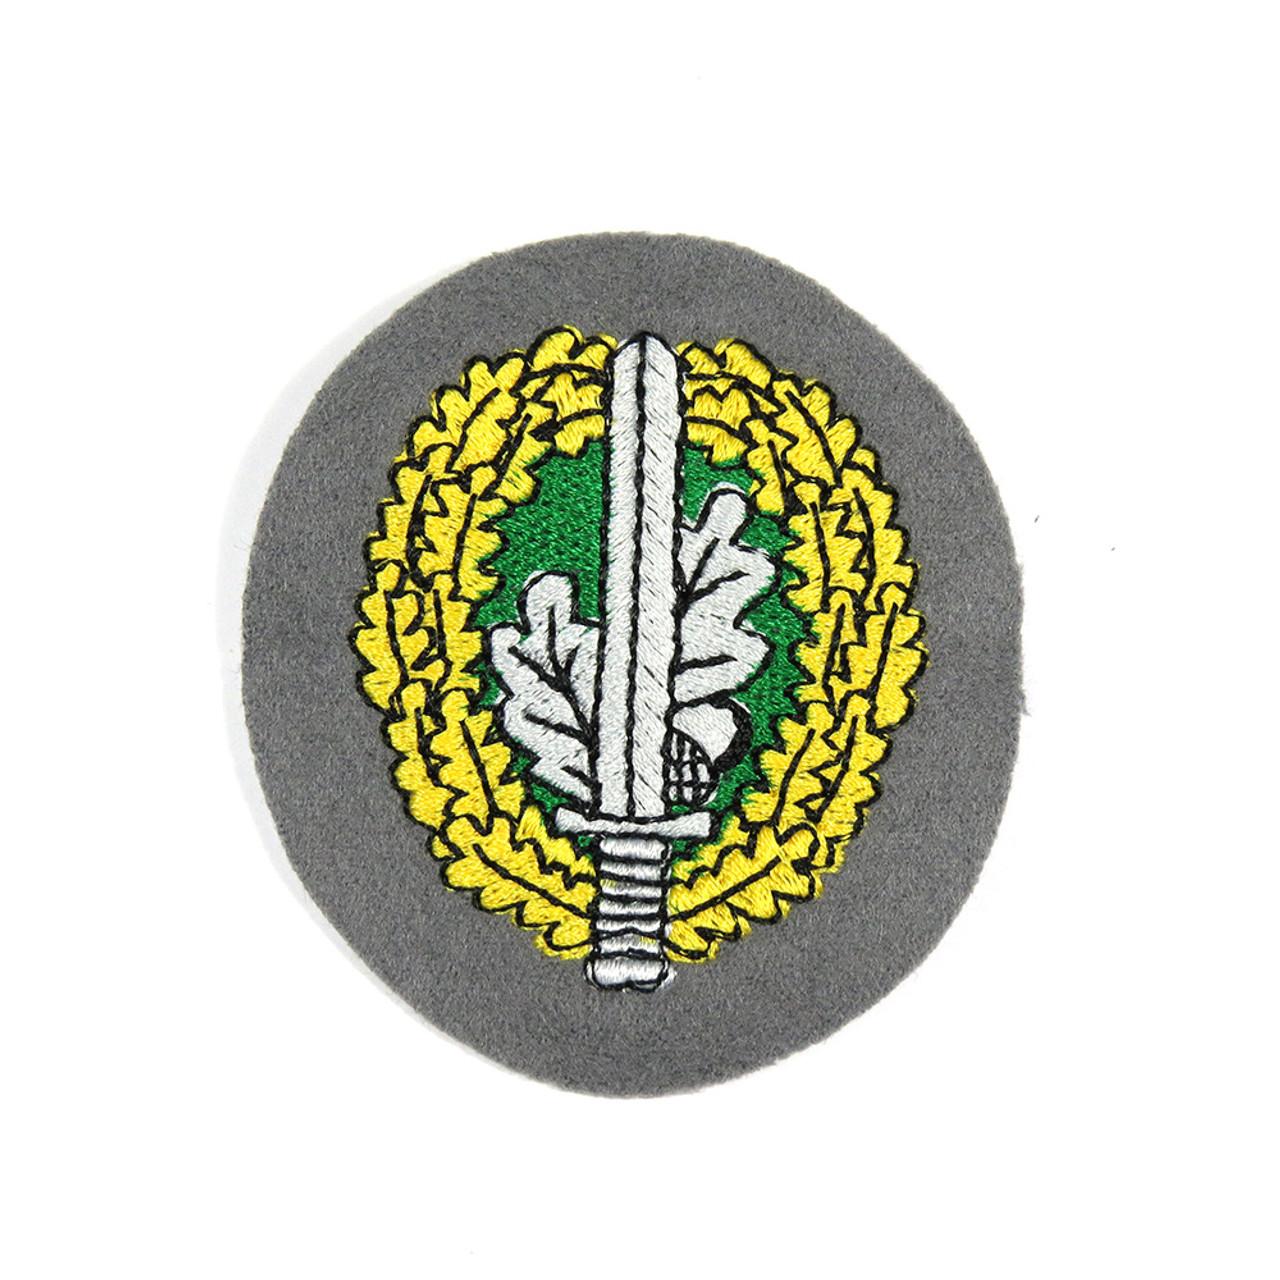 Kommandosoldat Patch